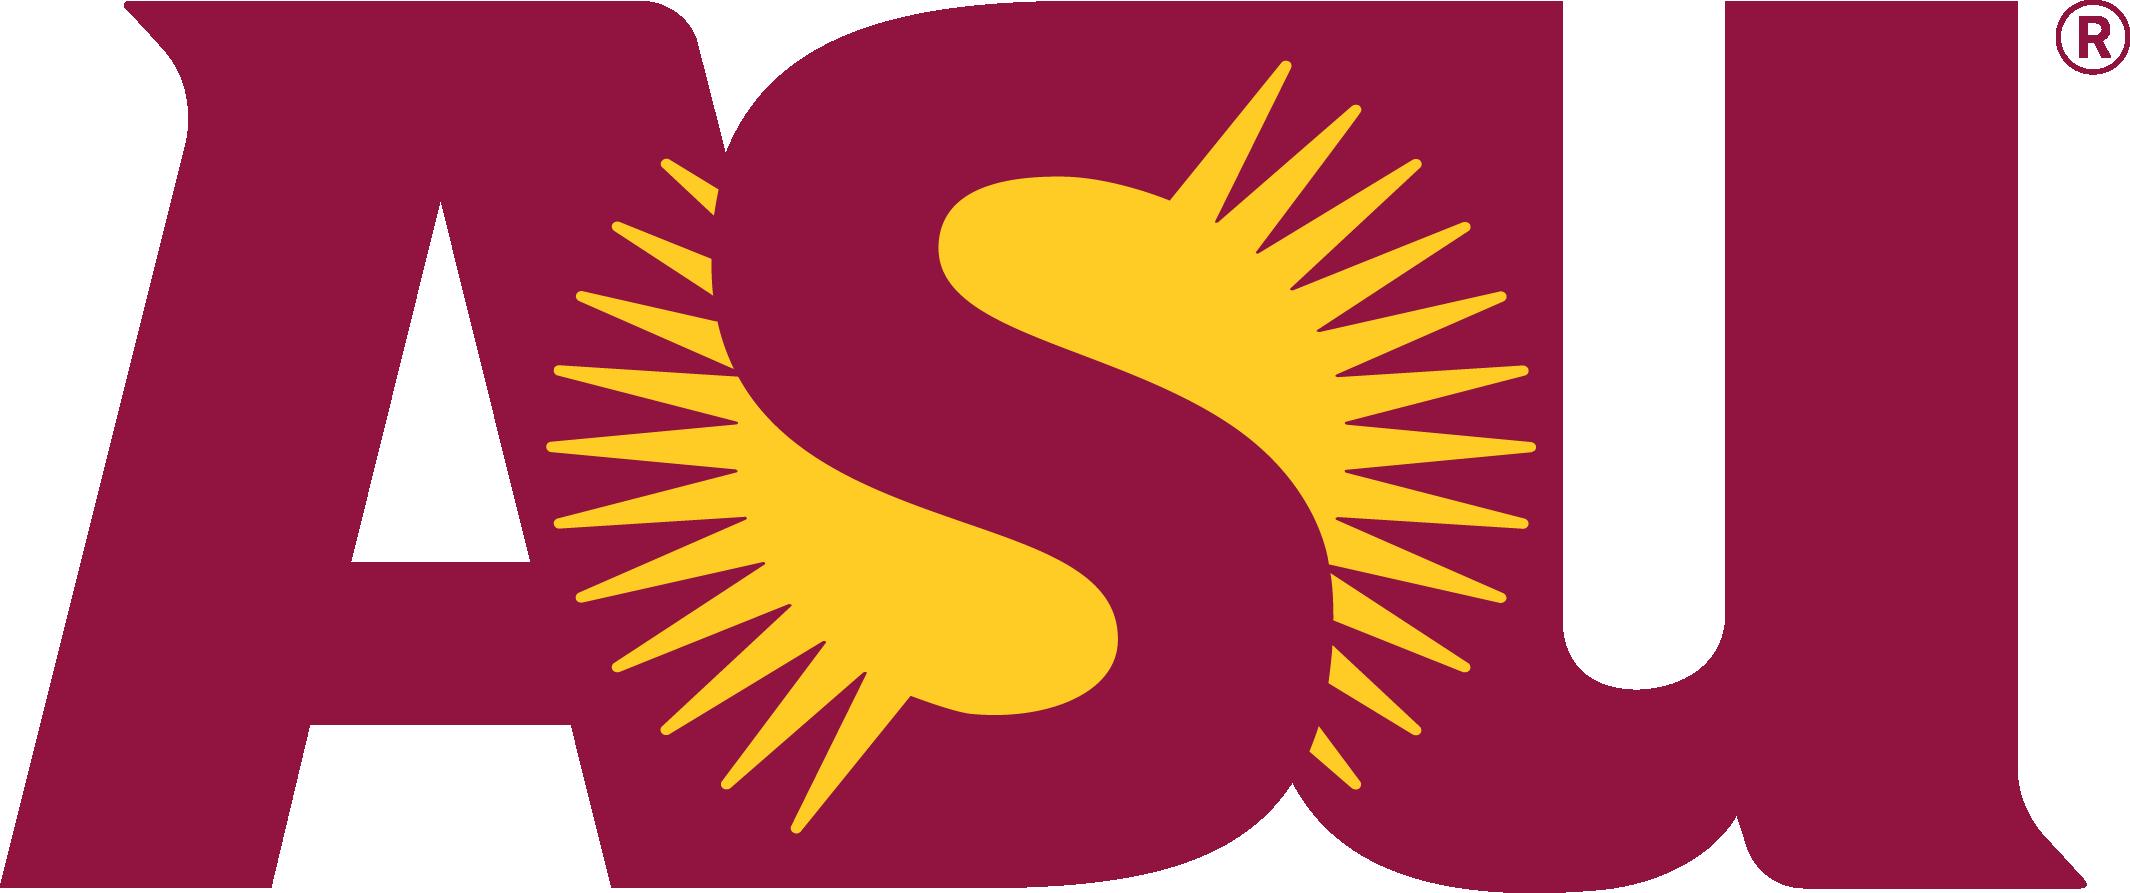 Asu sun devil clipart image stock ASU Logo – Arizona State University | World Universities Logos ... image stock